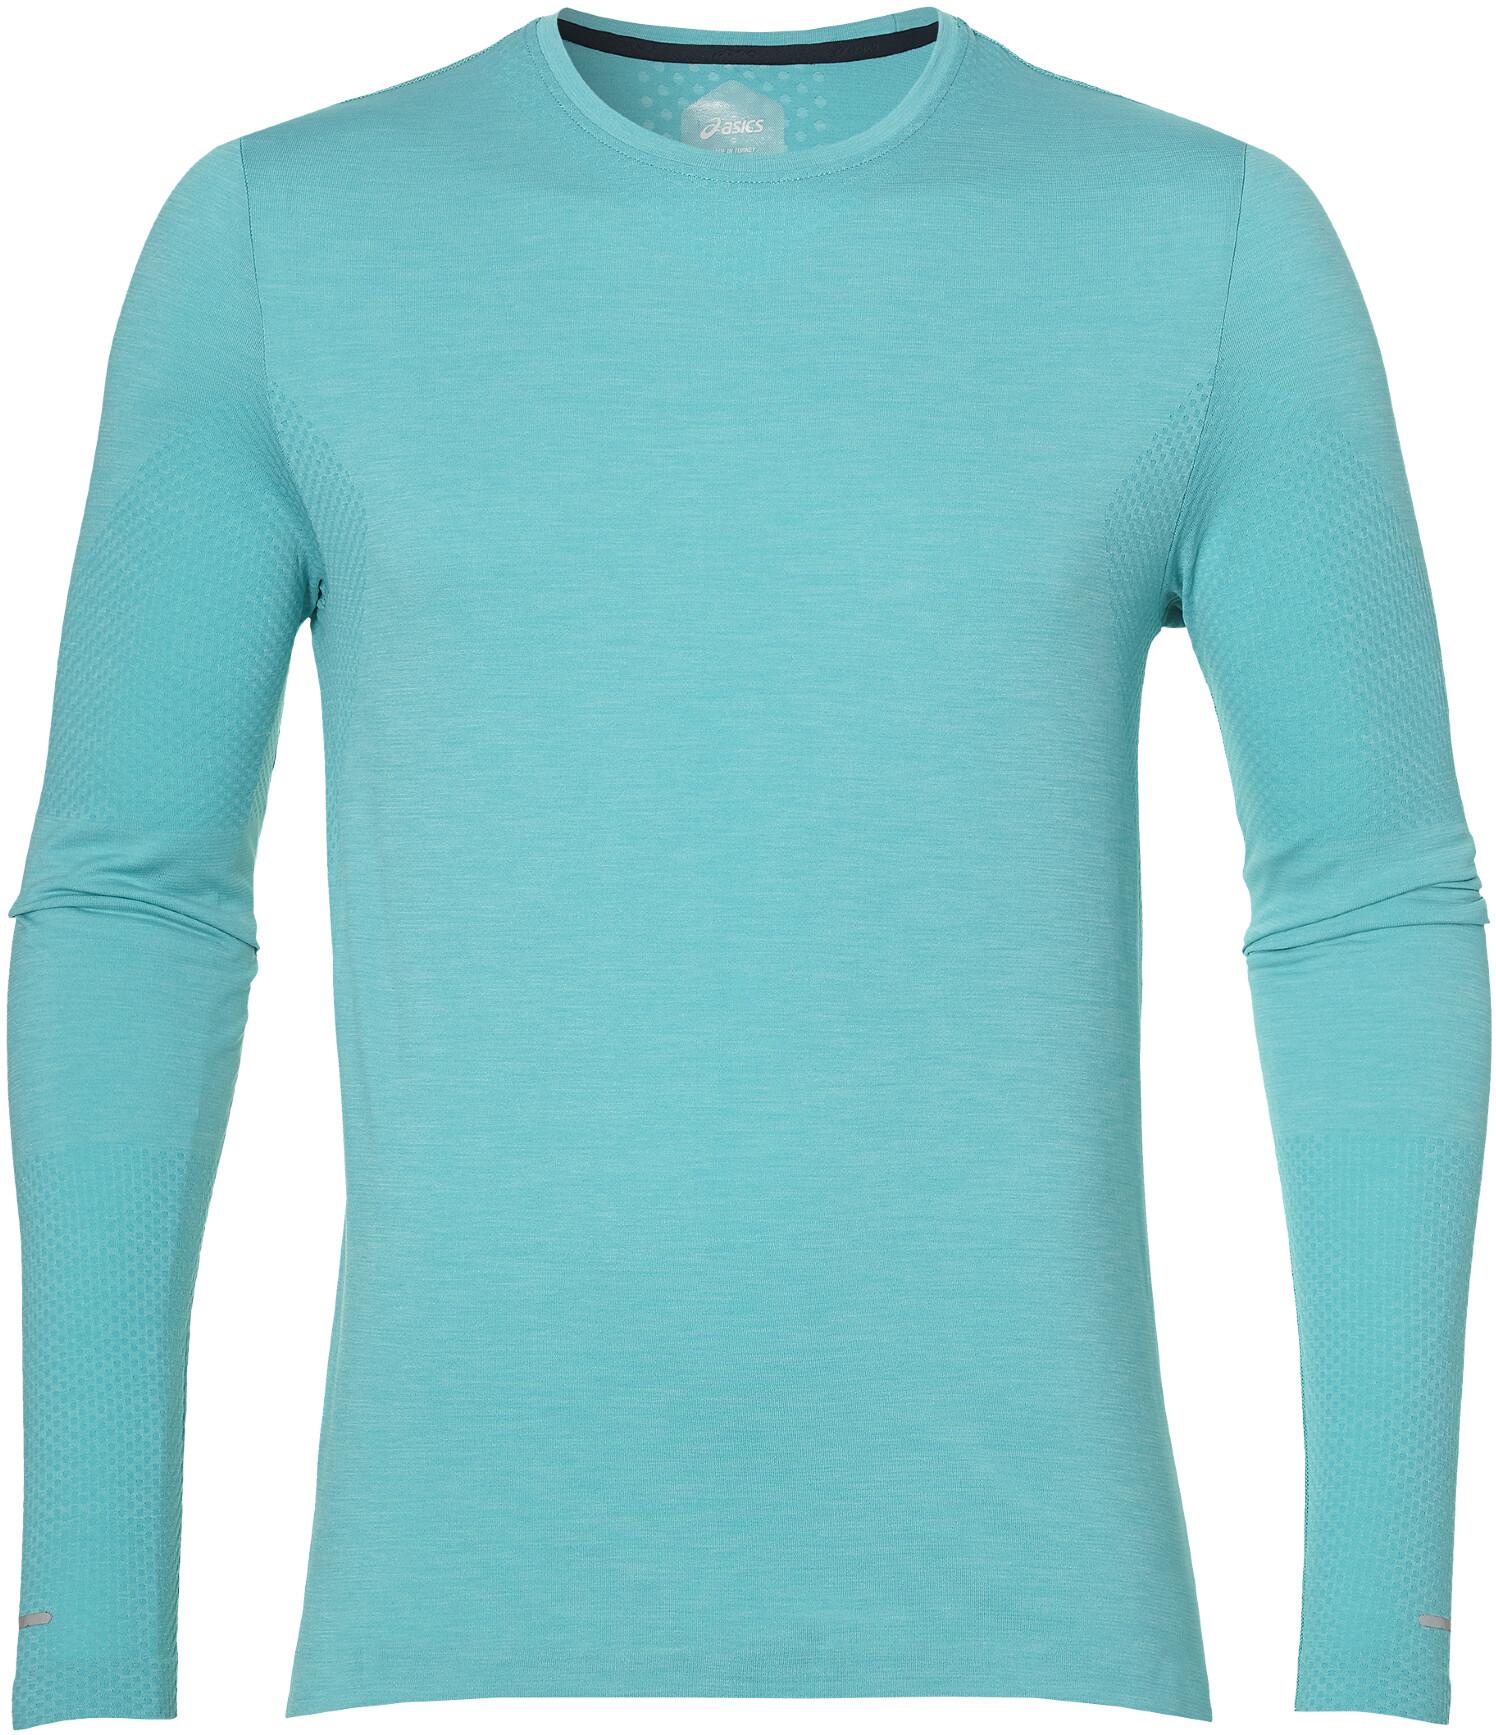 e48d792ad asics Seamless - Camiseta manga larga running Hombre - Turquesa ...